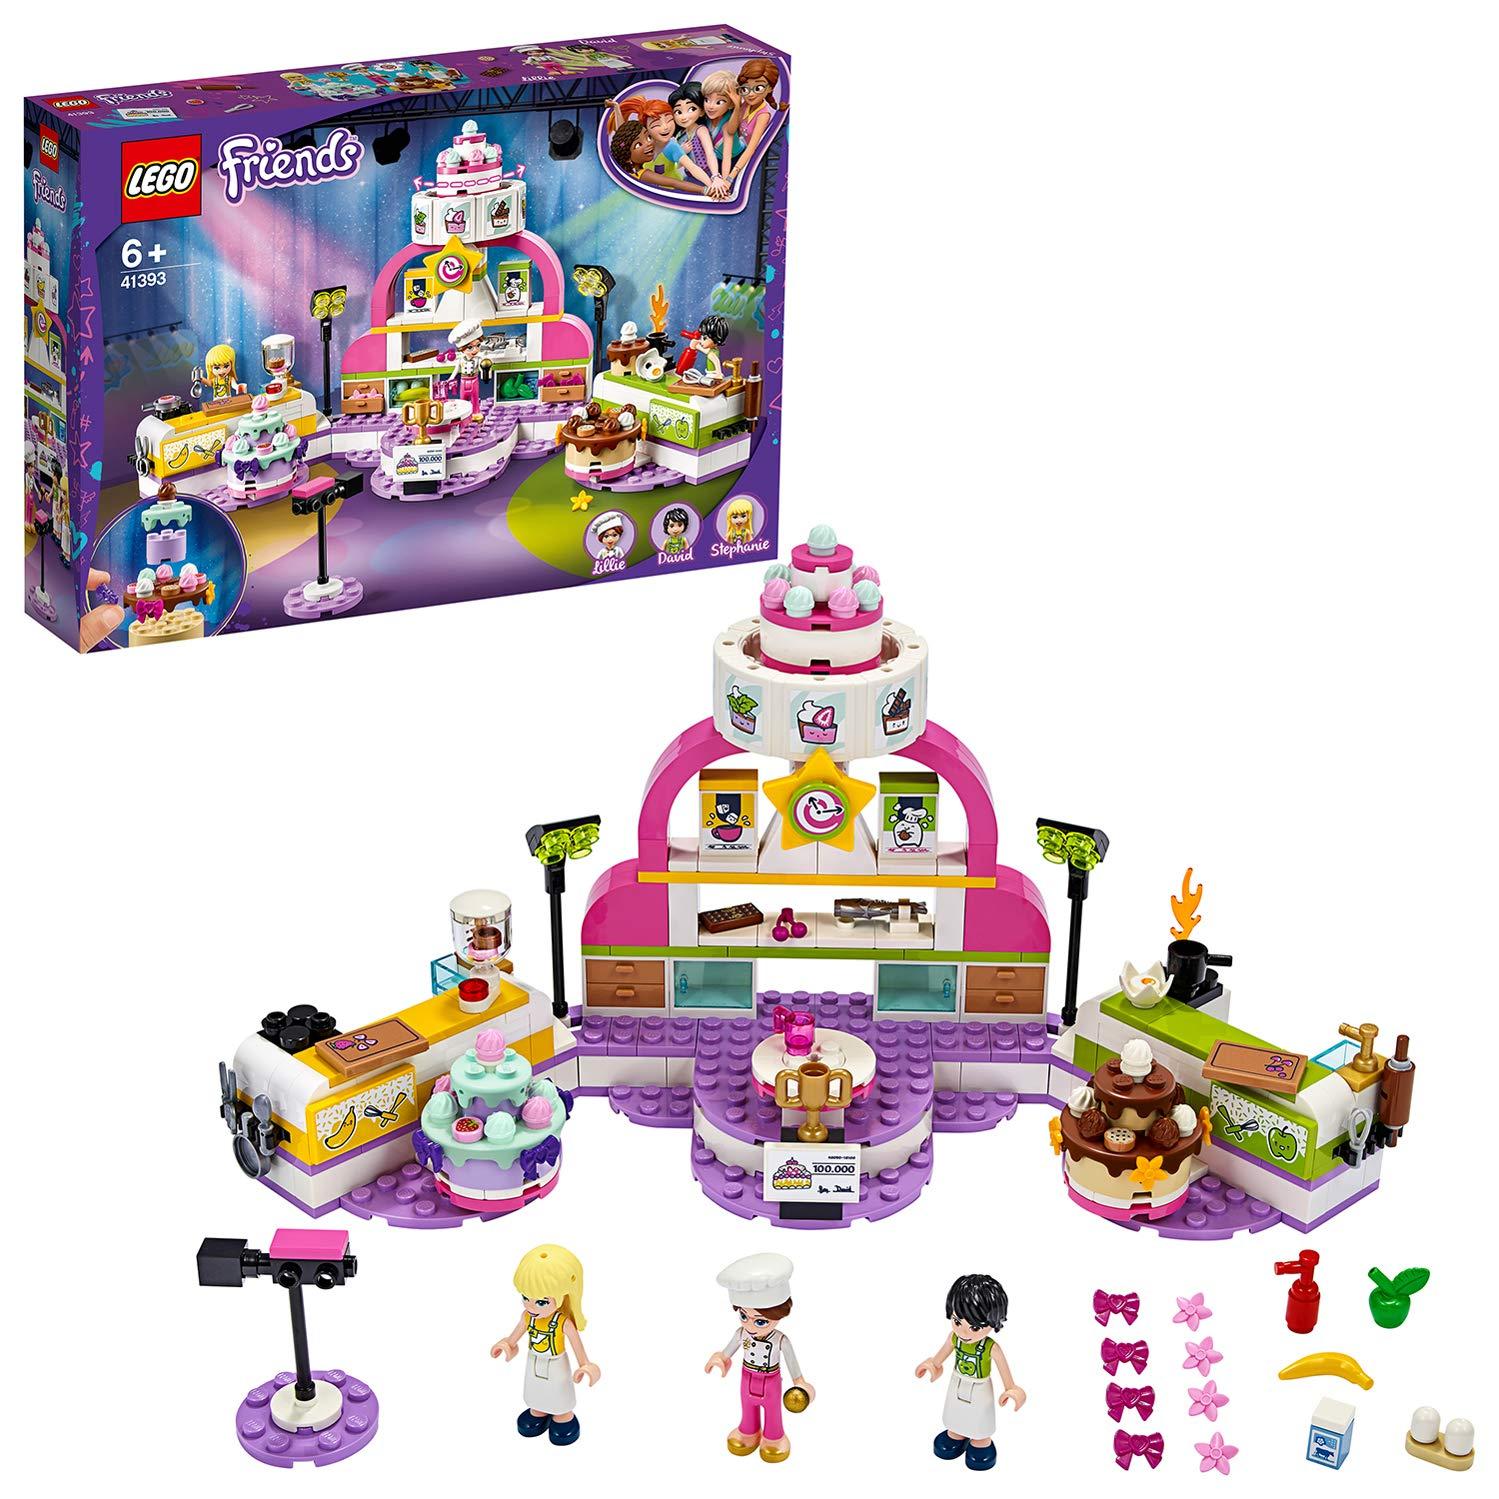 LEGO41393FriendsBakingCompetitionPlaysetwithToyCakes,CupcakesandStephanieMiniDoll,for6+YearOld